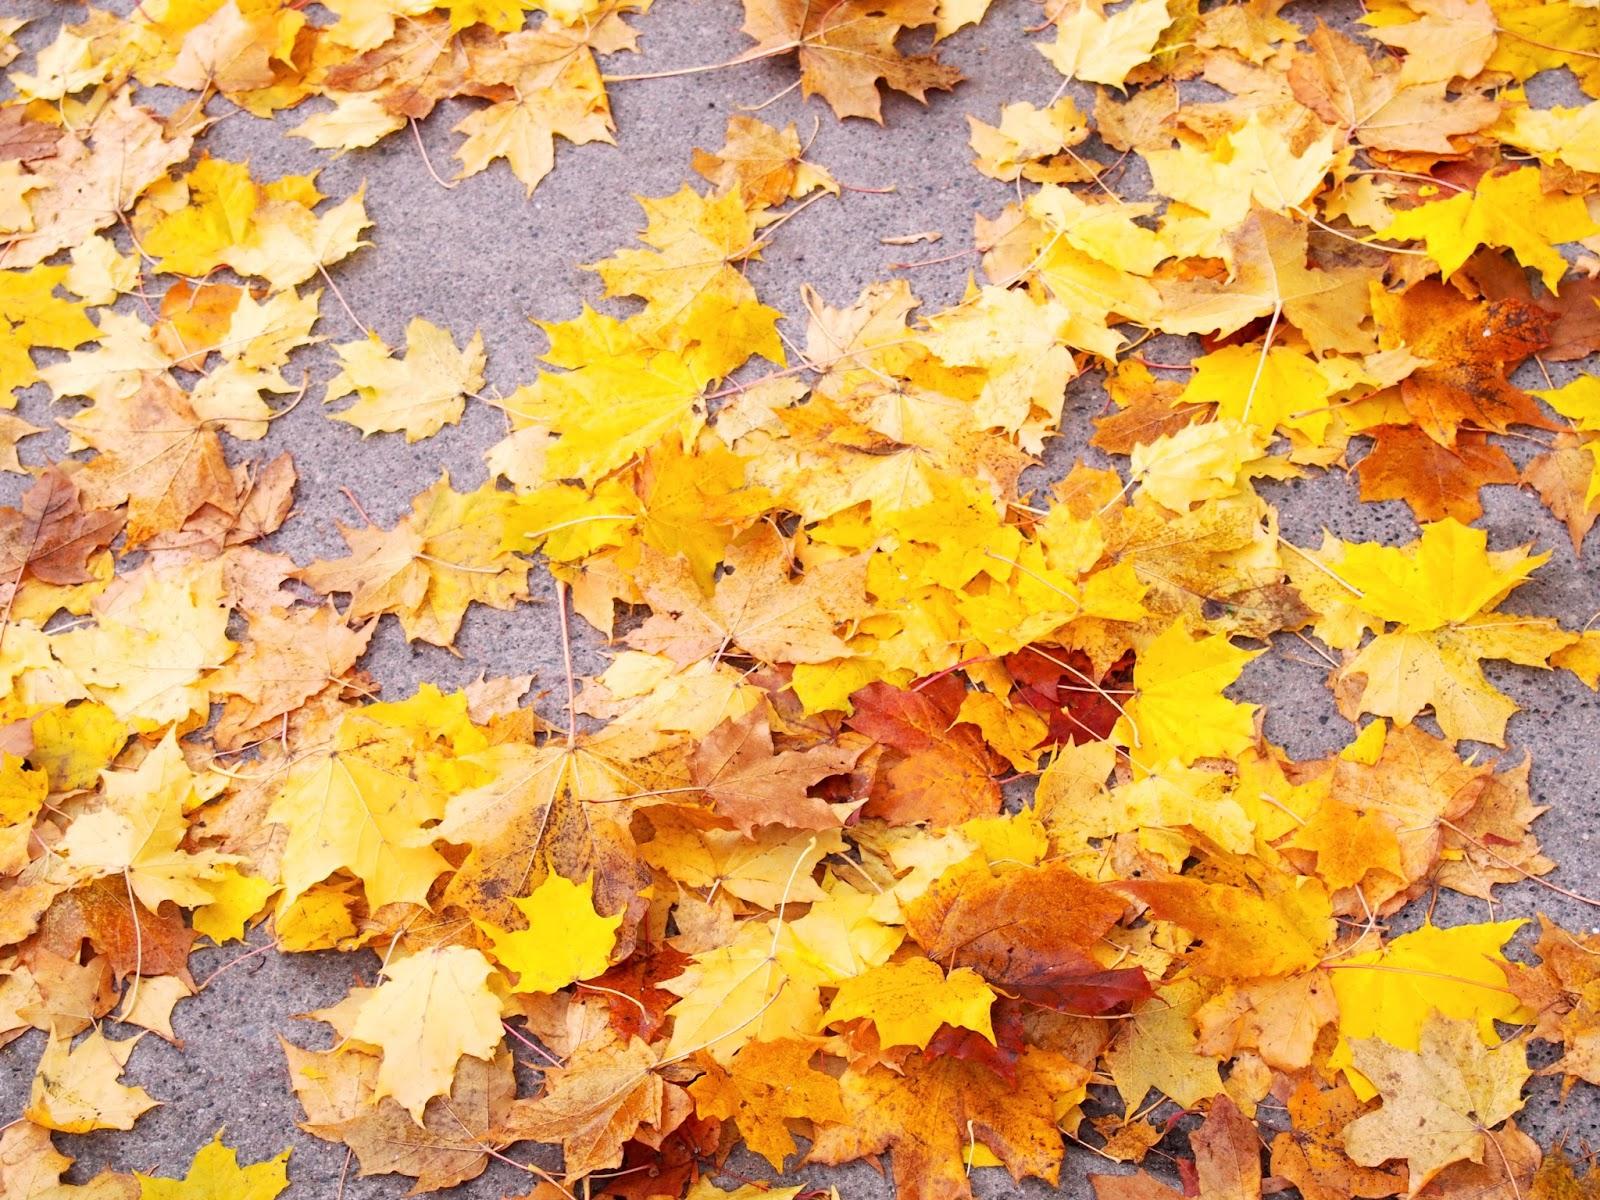 Fall, syksy, autumn, color, colour, ruska, lehti, leaf, leaves